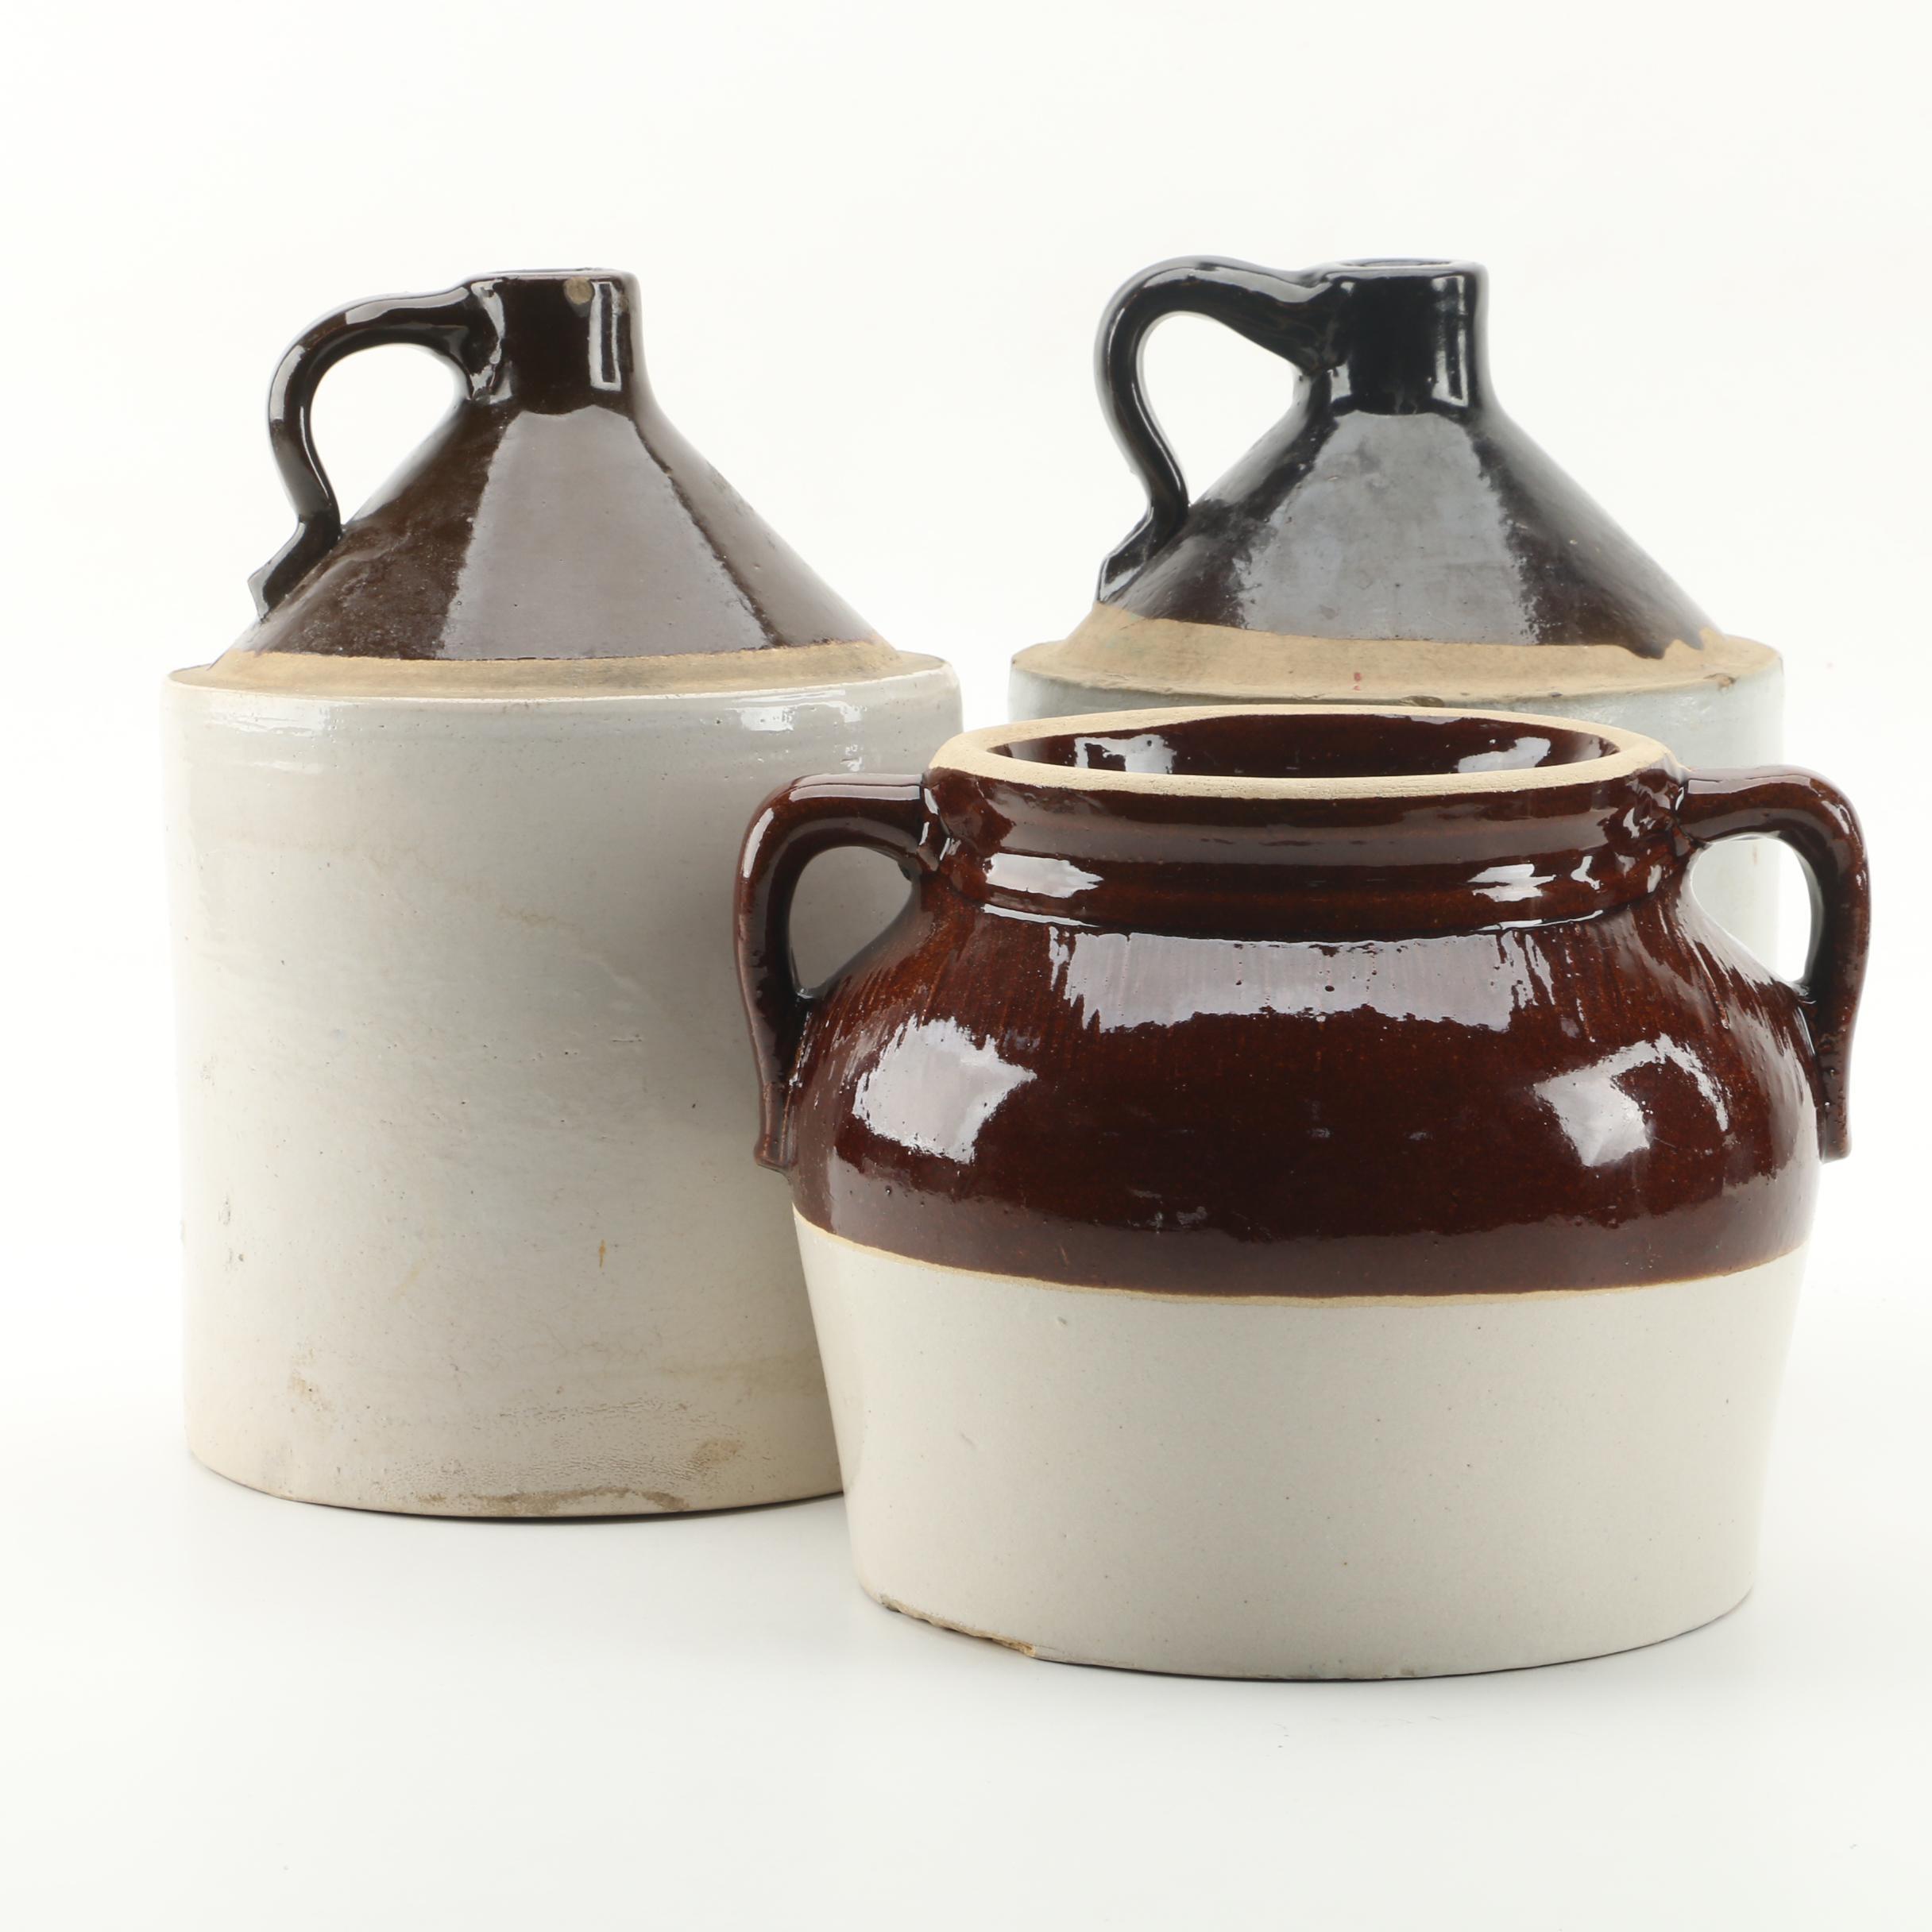 Vintage Stoneware Jugs and Robinson Ransbottom Four Quart Bean Pot